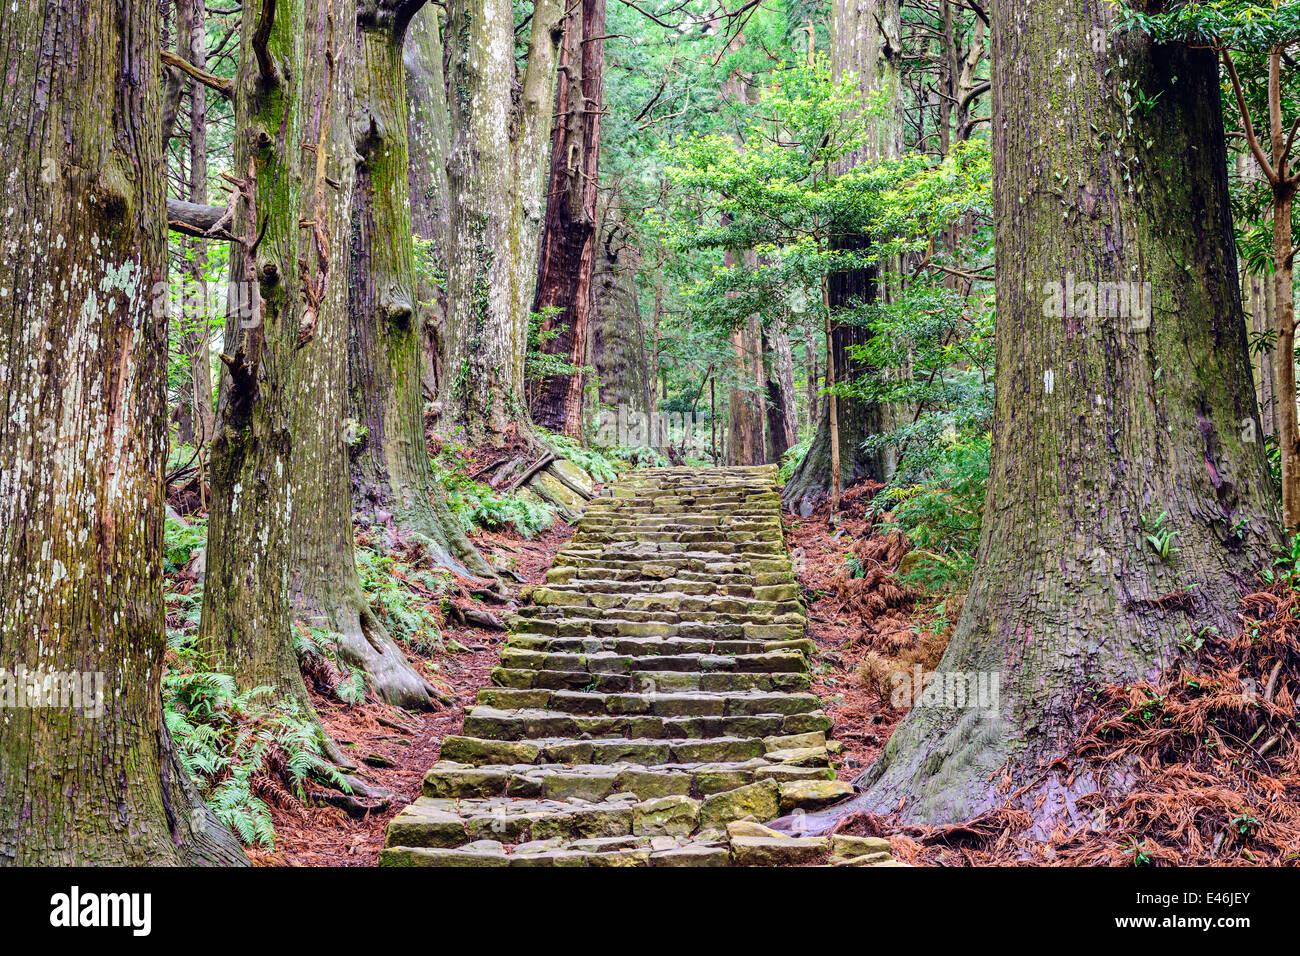 Kumano Kodo at Daimon-zaka, a sacred trail designated as a UNESCO World Heritage site in Nachi, Wakayama, Japan. - Stock Image